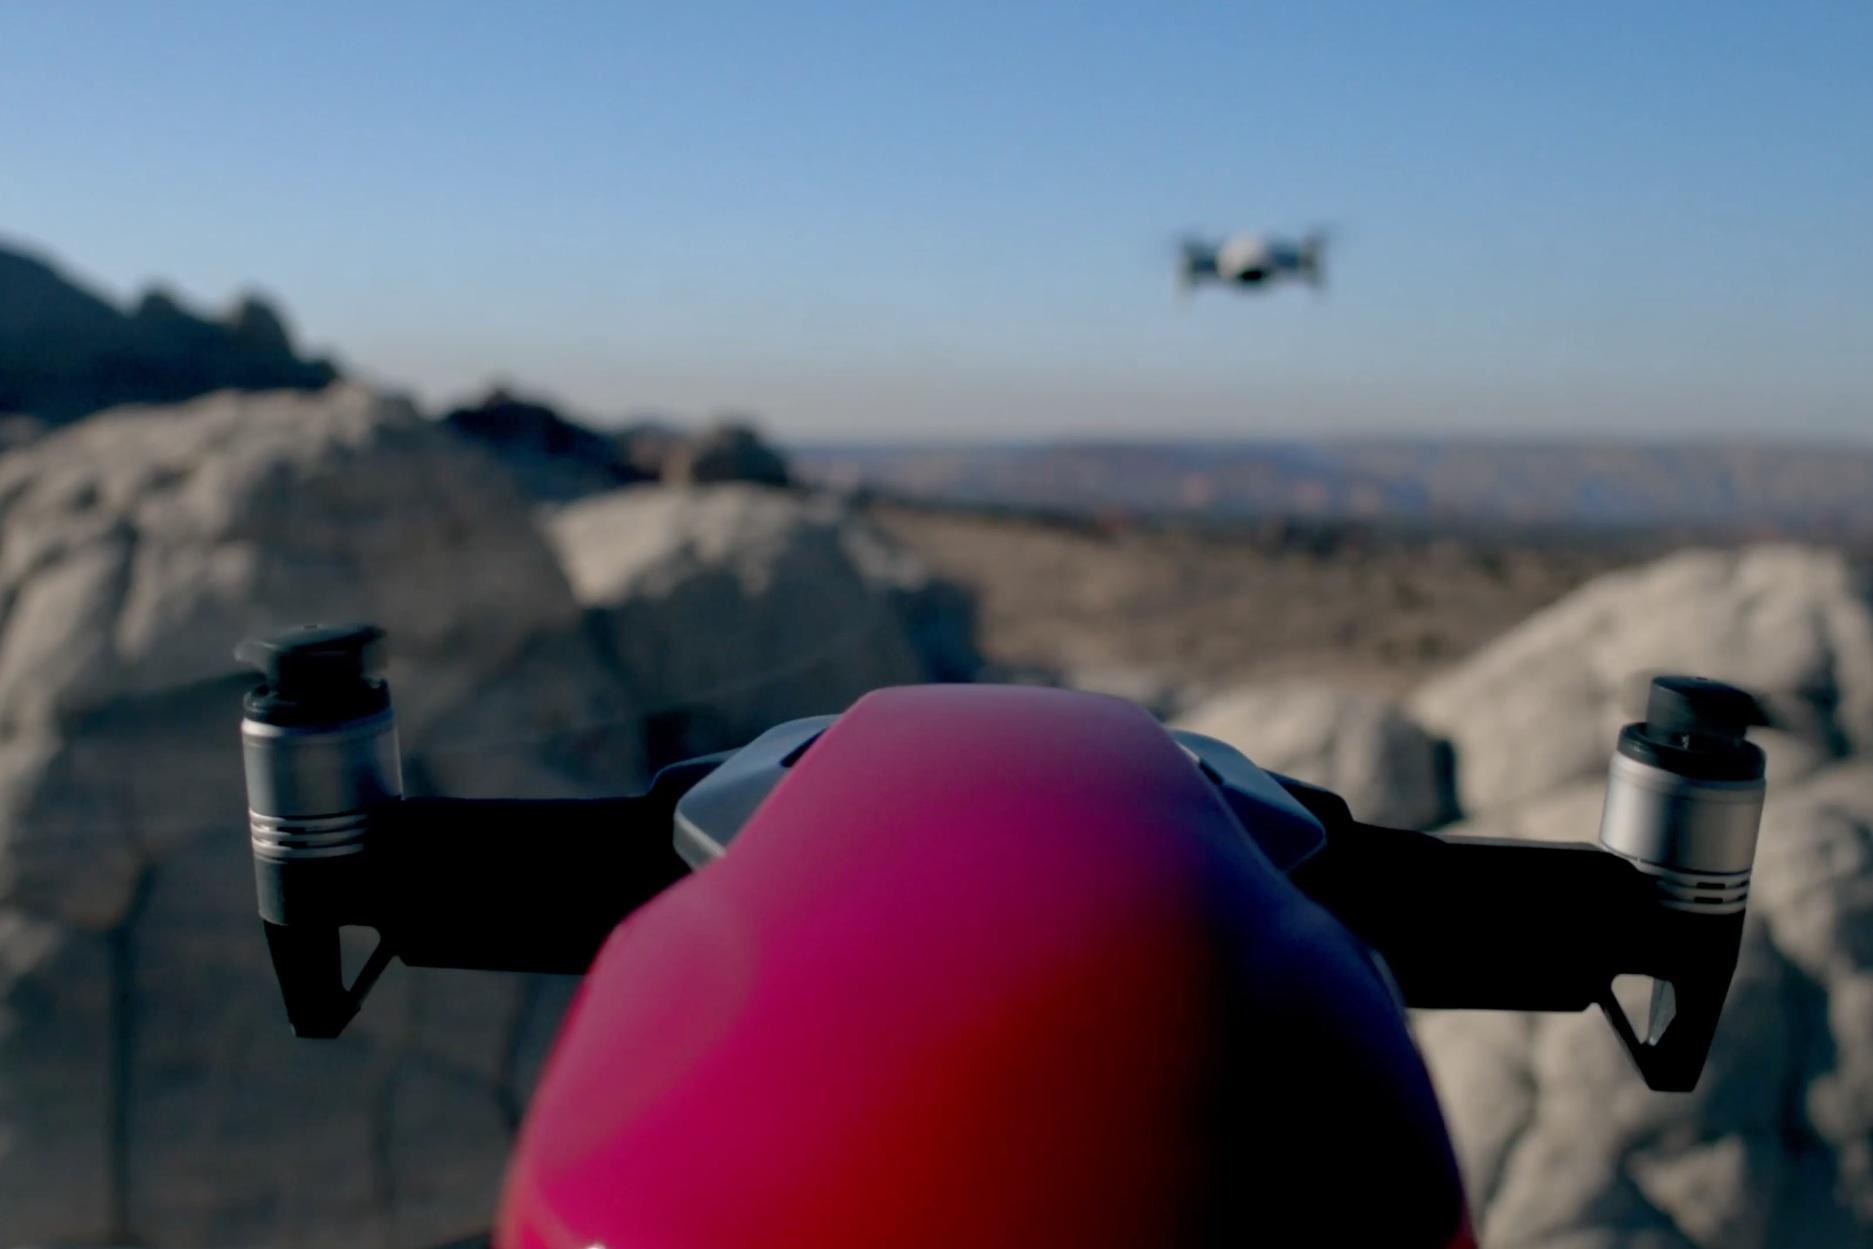 On camera drone -